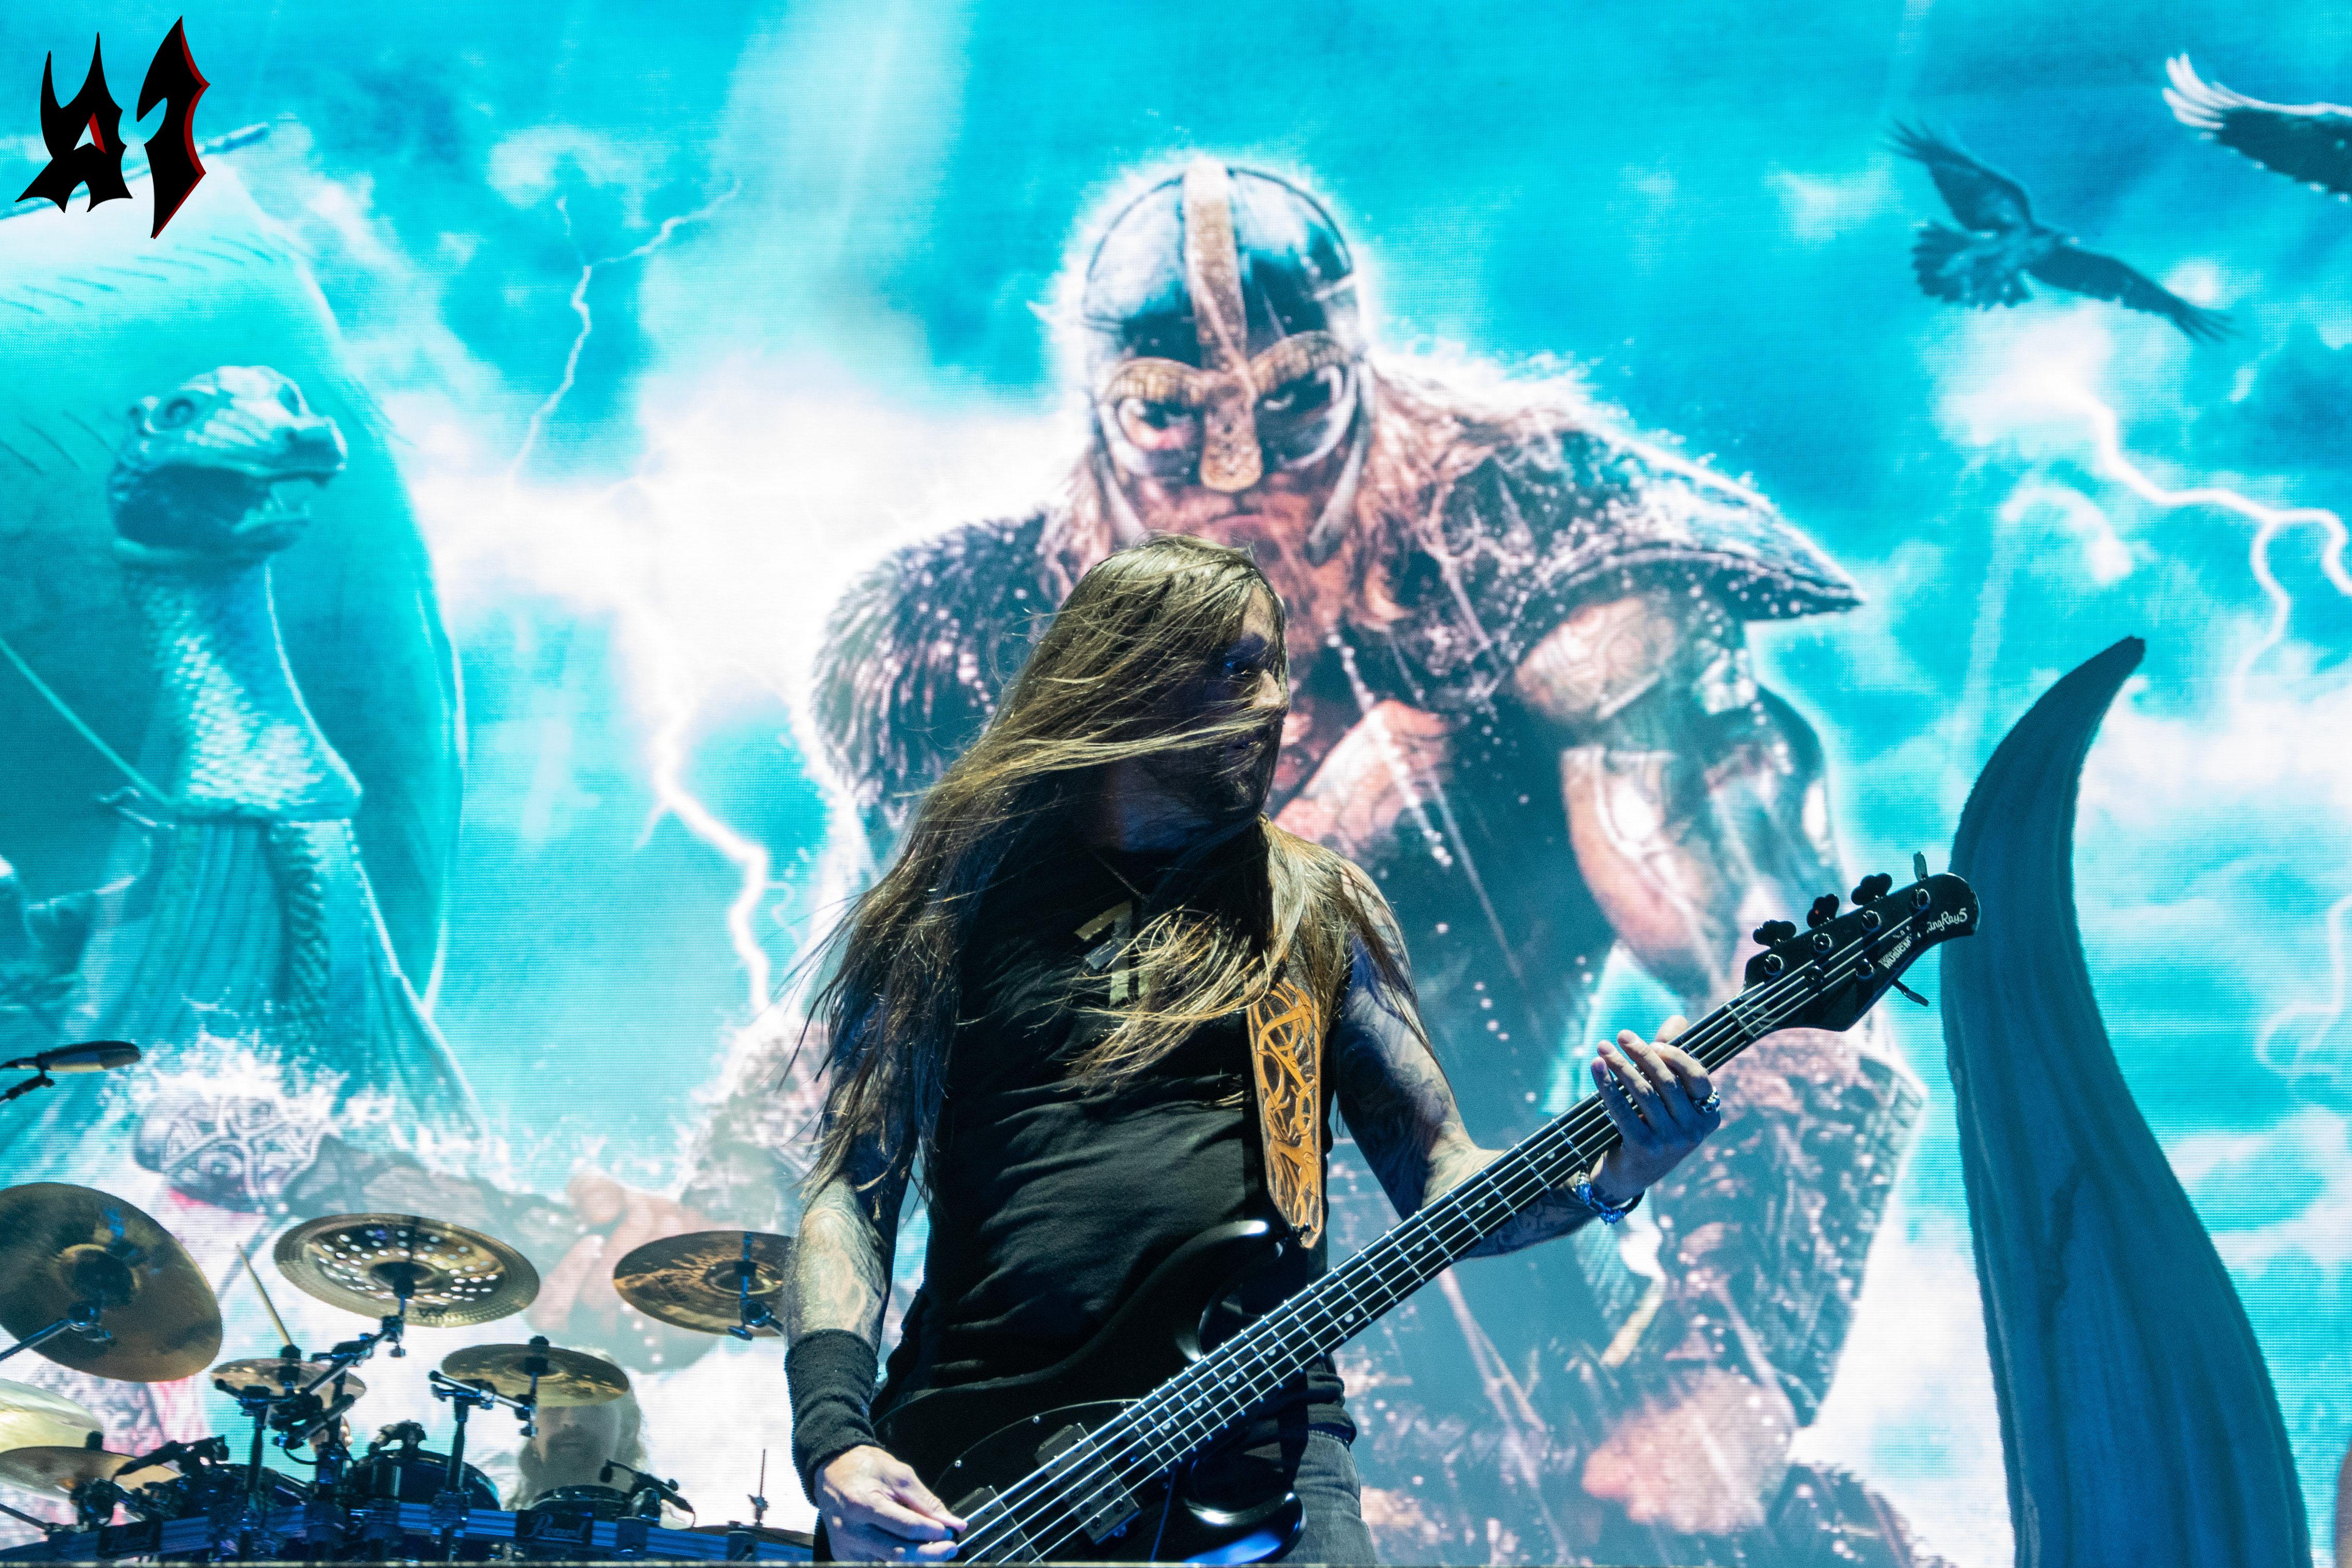 Knotfest - Amon Amarth - 7